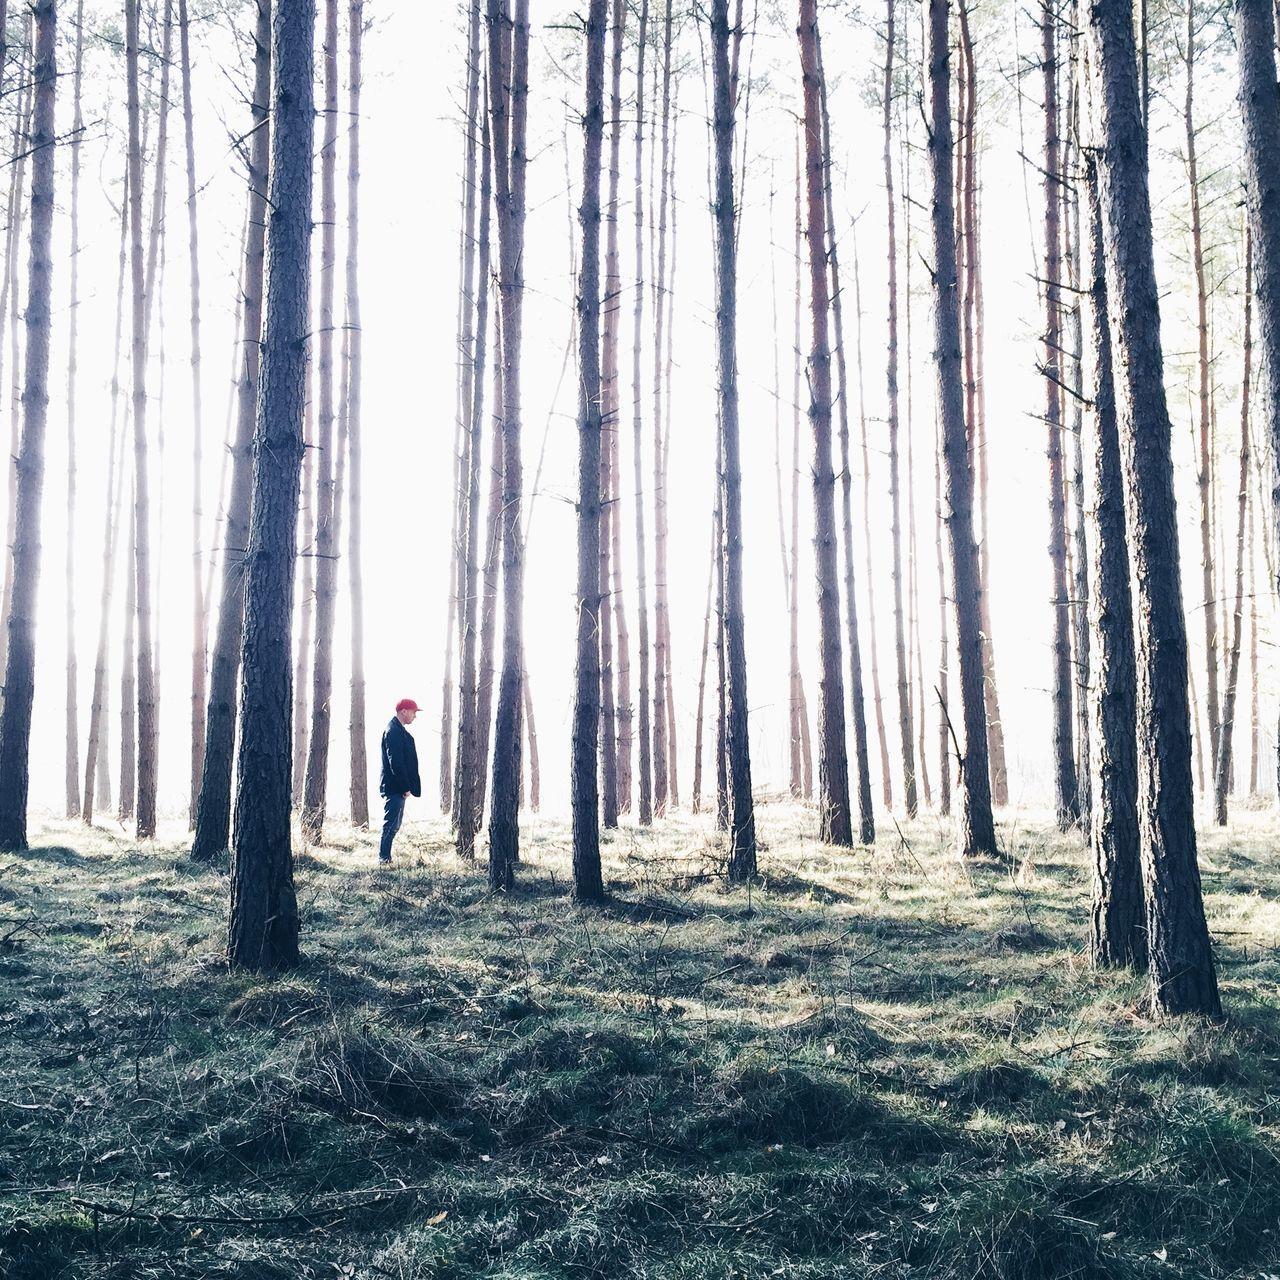 The Human Condition EyeEm Best Shots VSCO Secret Garden IPSTrees&Leaves Exploring New Ground IPSNatural The Moment - 2015 EyeEm Awards The Traveler - 2015 EyeEm Awards The Great Outdoors - 2015 EyeEm Awards IPS2015Fall